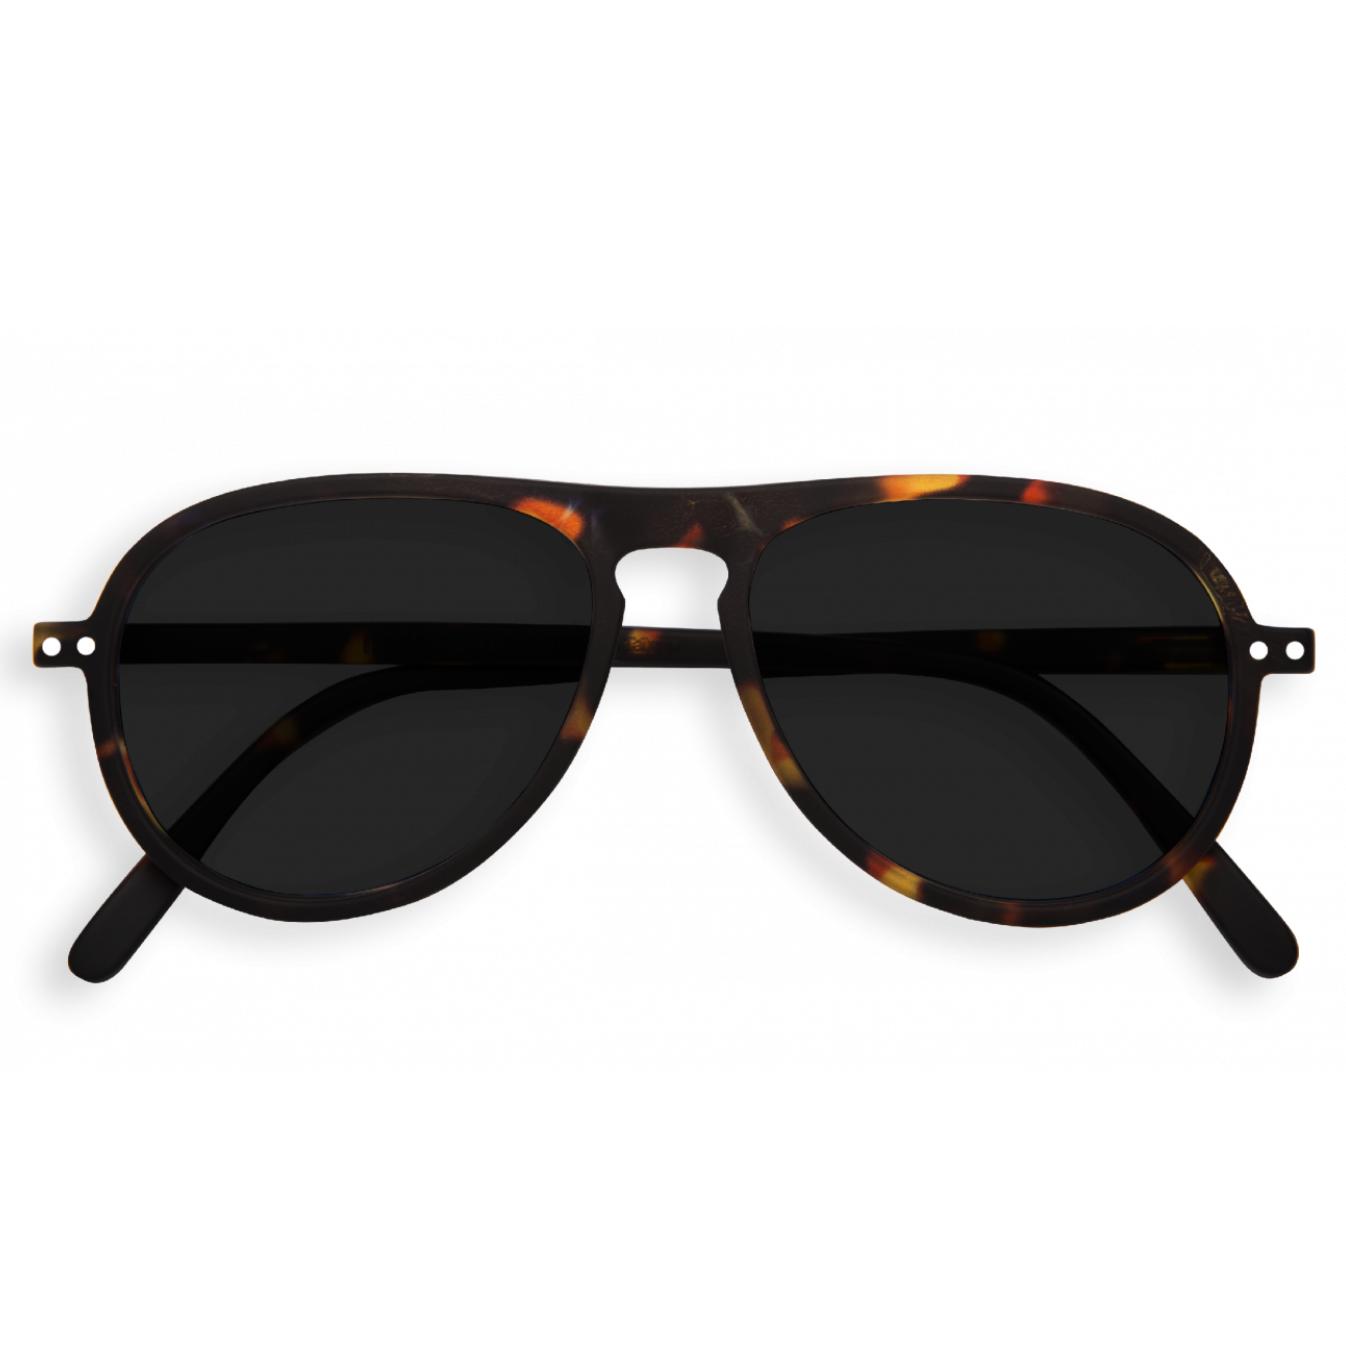 Sunglasses #I - The Aviator - Tortoise